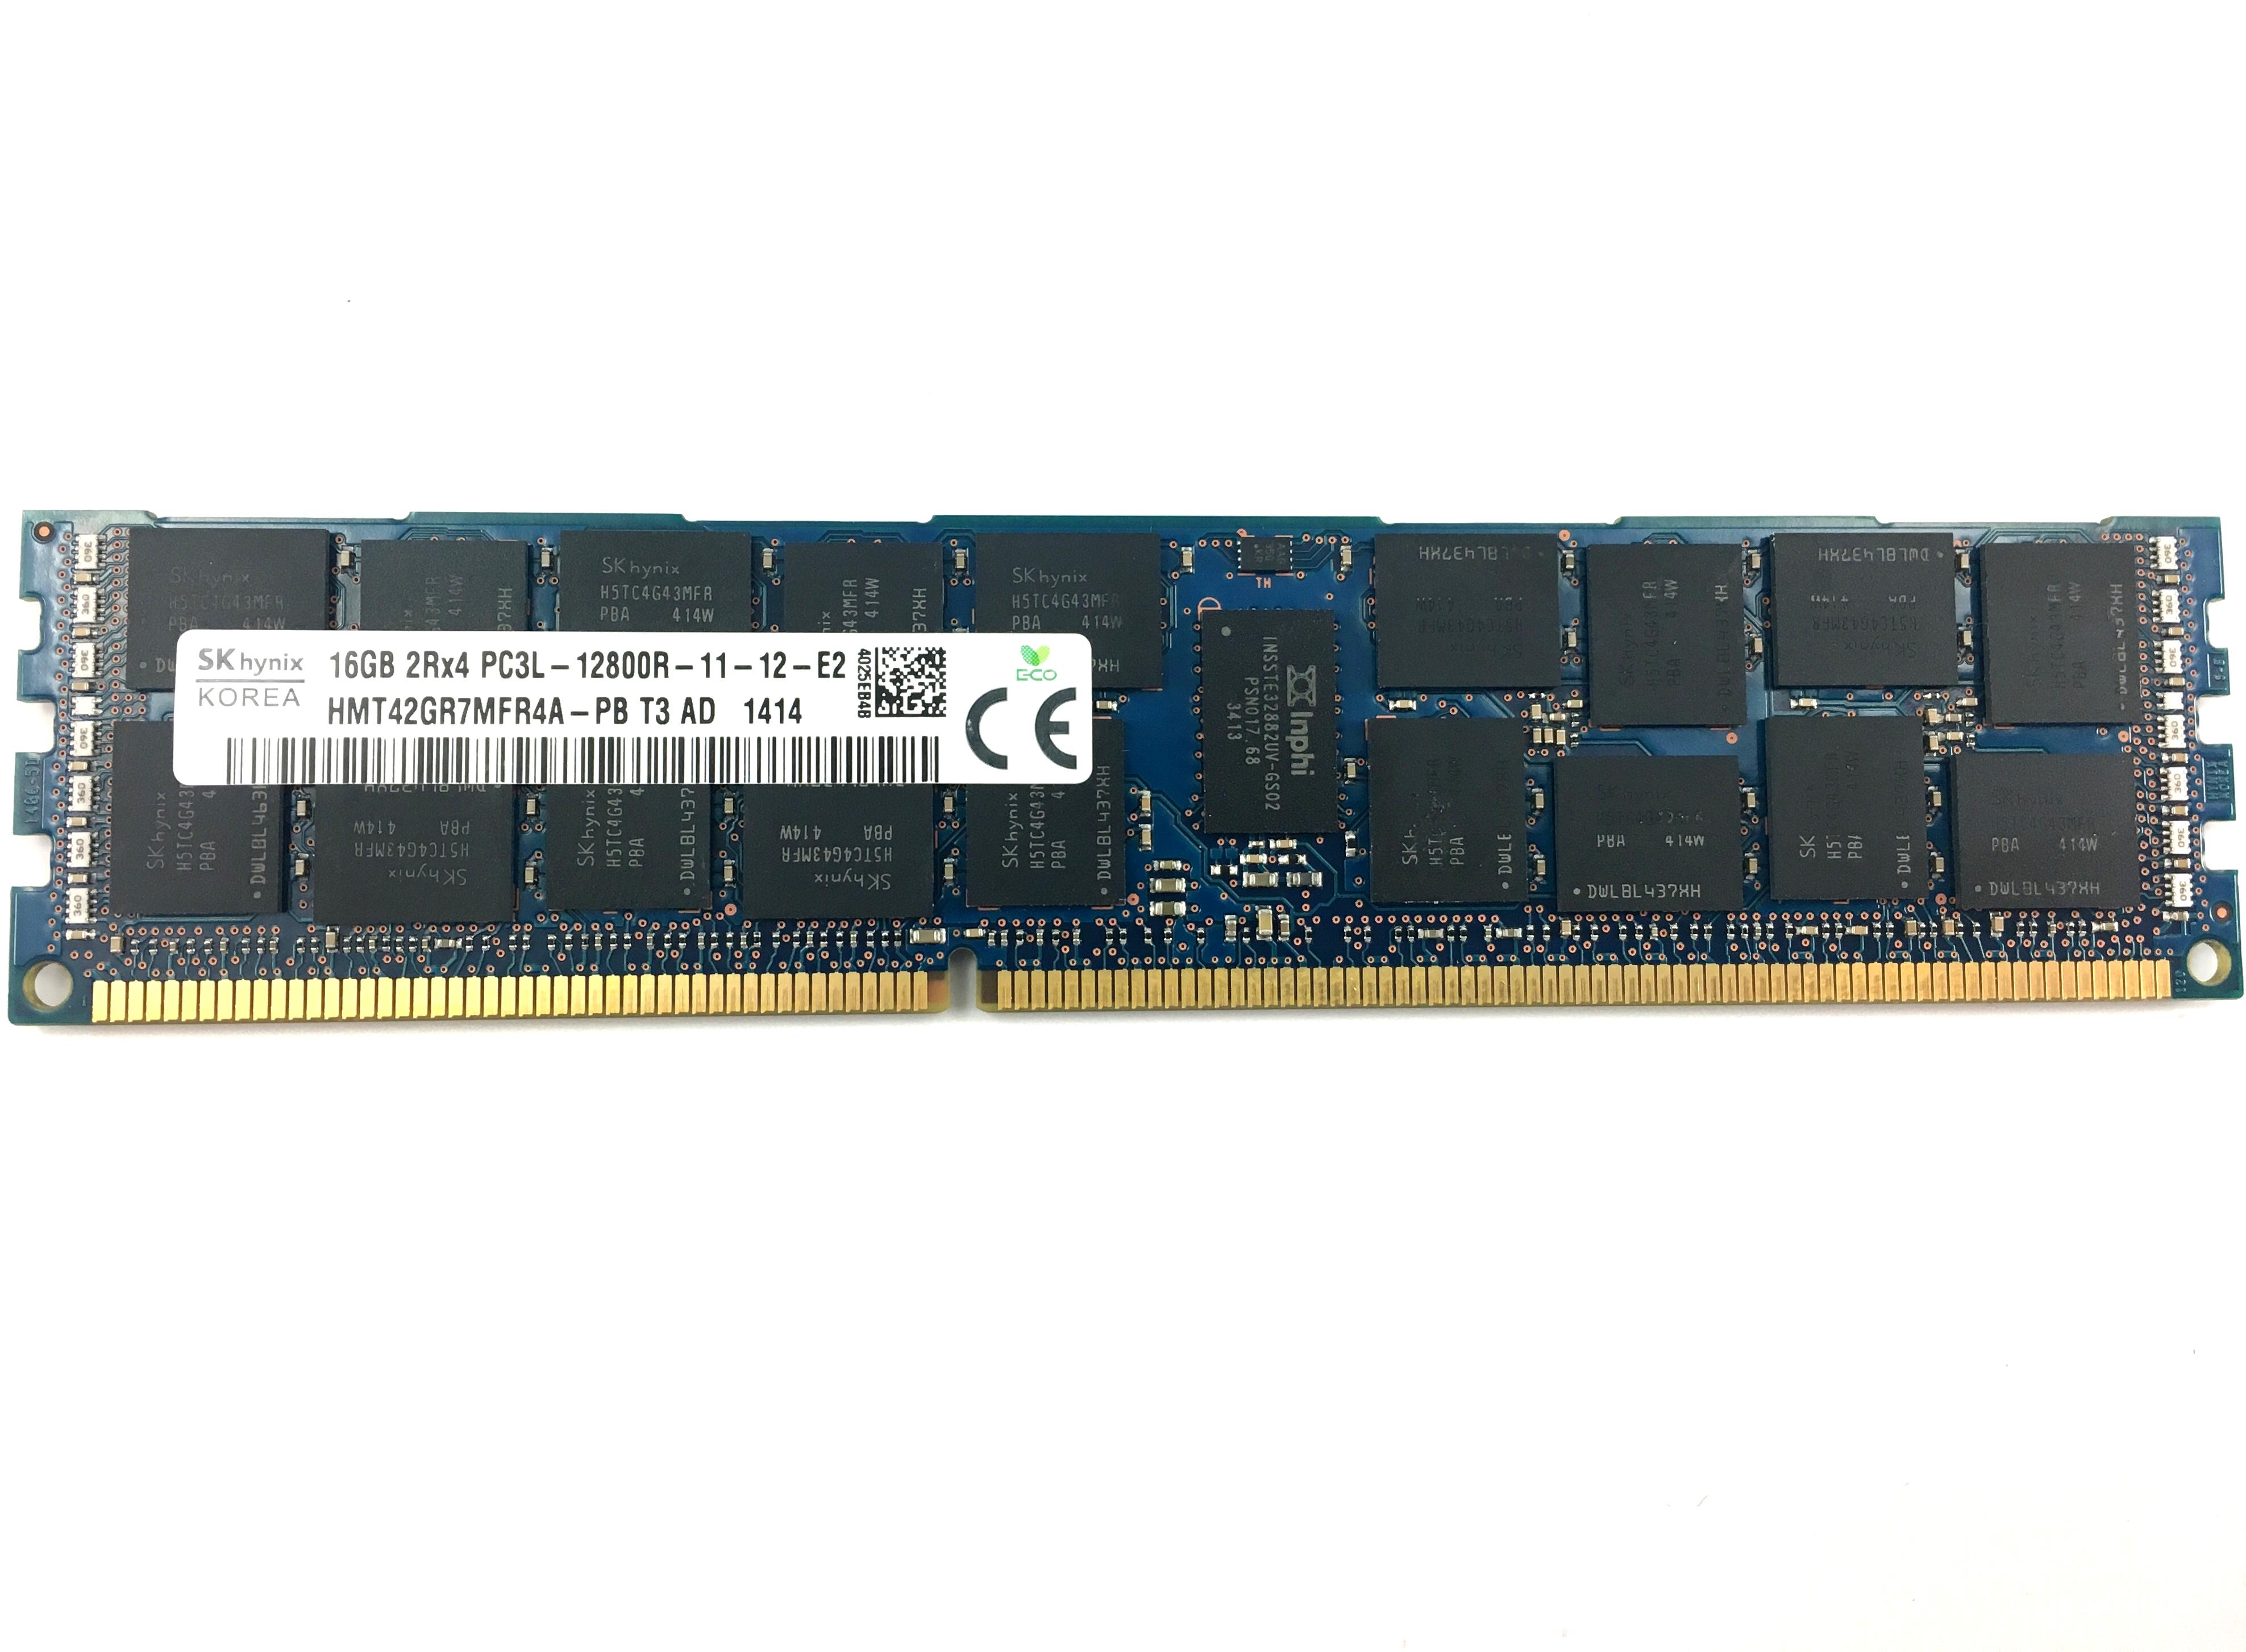 Hynix 16GB 2Rx4 PC3L-12800R DDR3 1600MHz ECC Registered Memory Module (HMT42GR7MFR4A-PB)